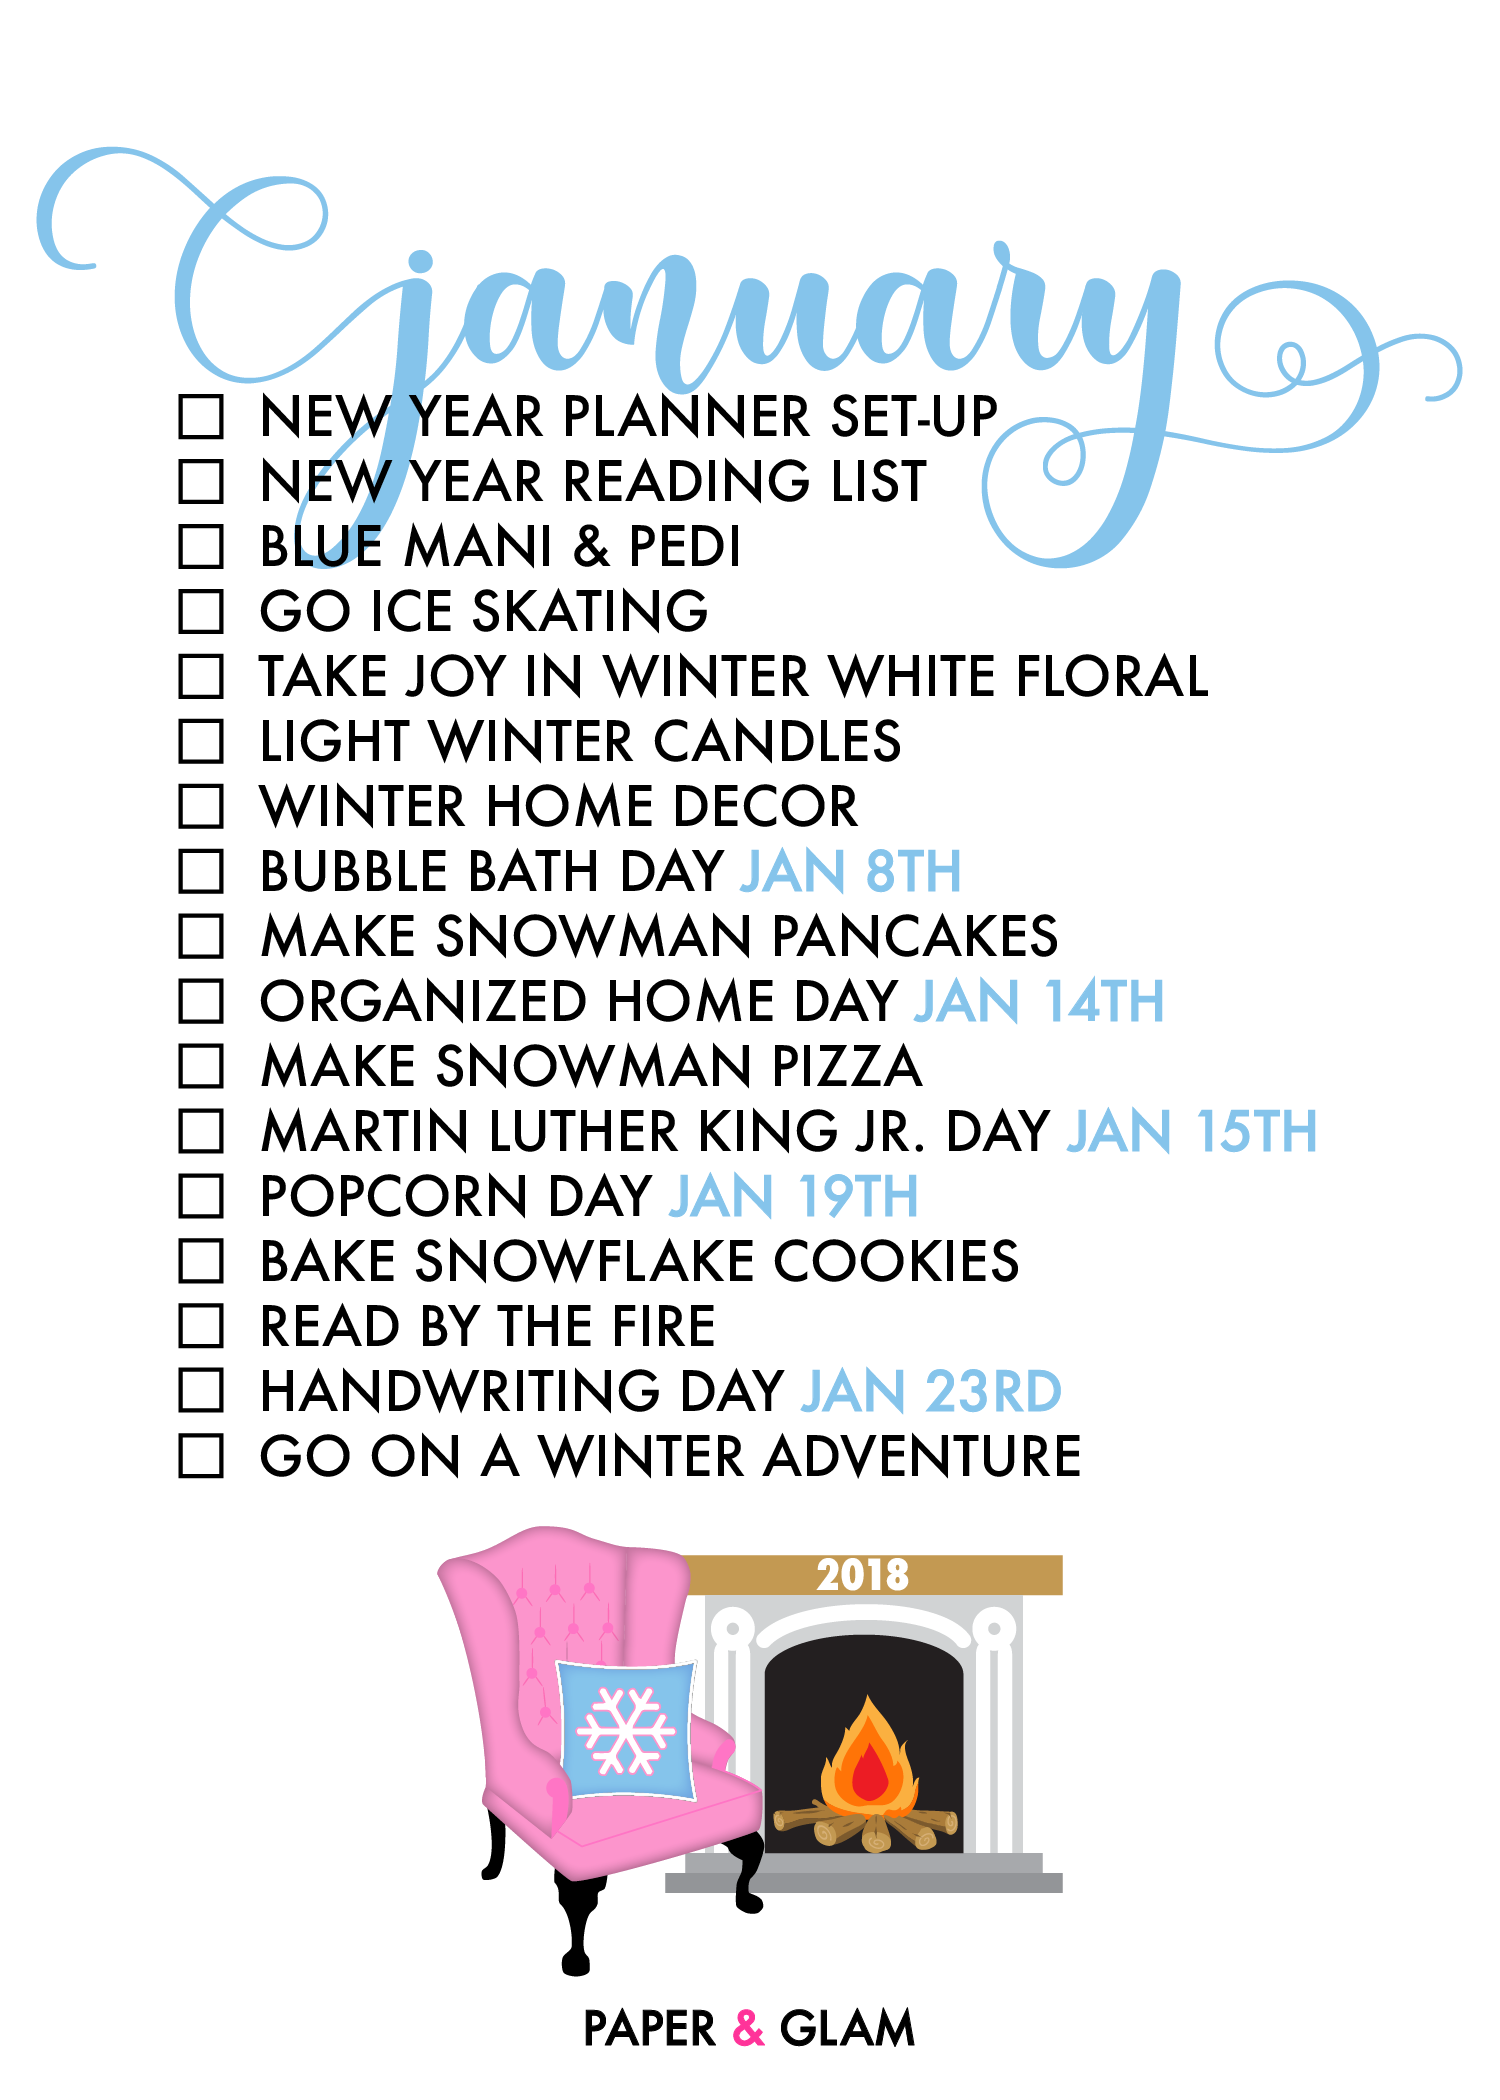 January Seasonal Living List